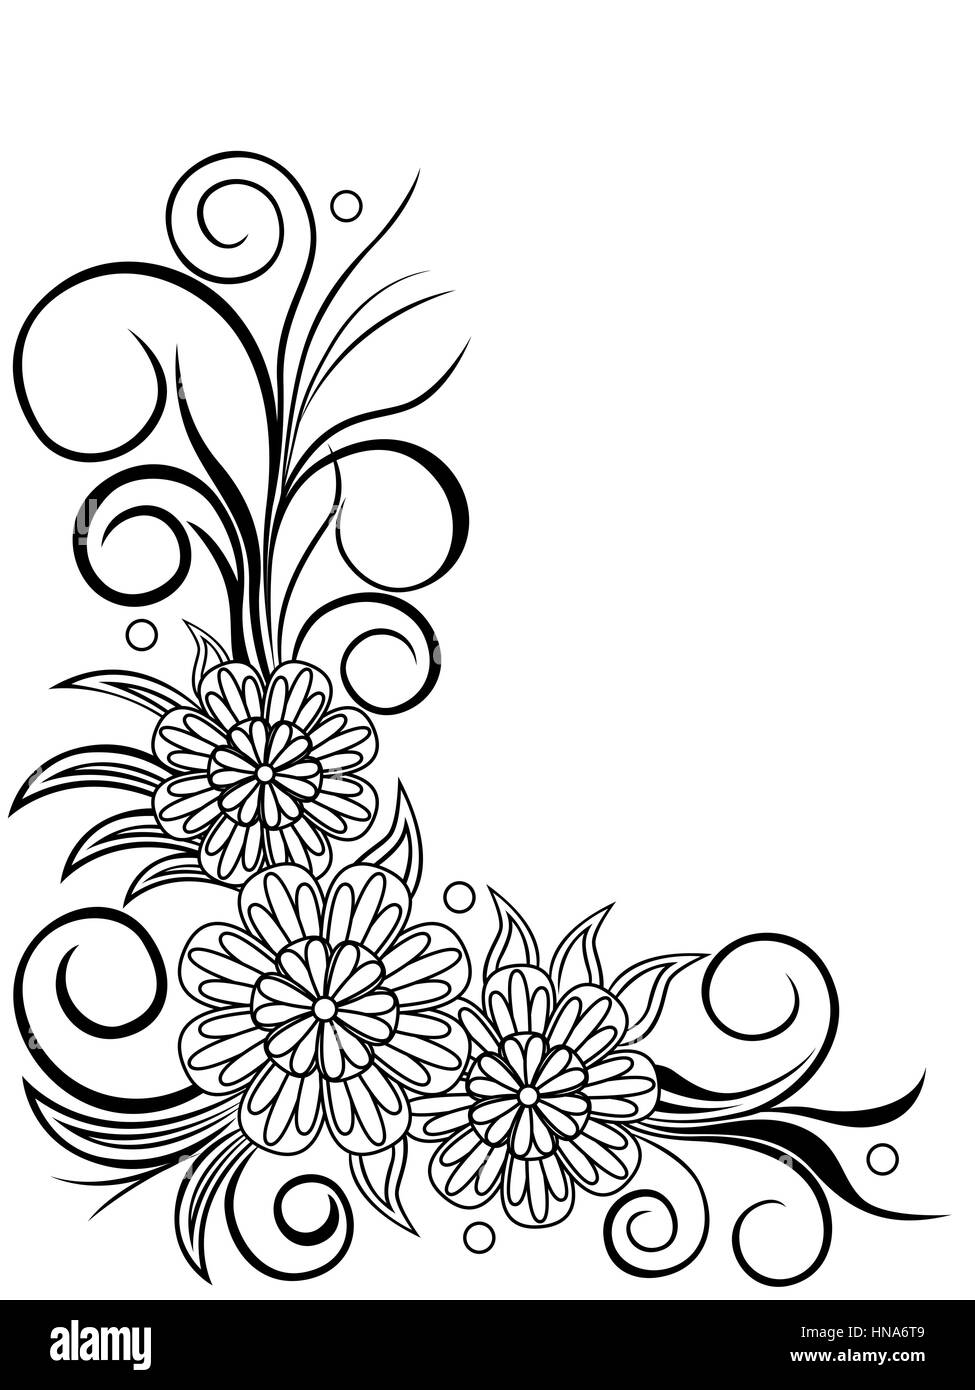 Sheet with floral corner design, hand drawing vector illustration